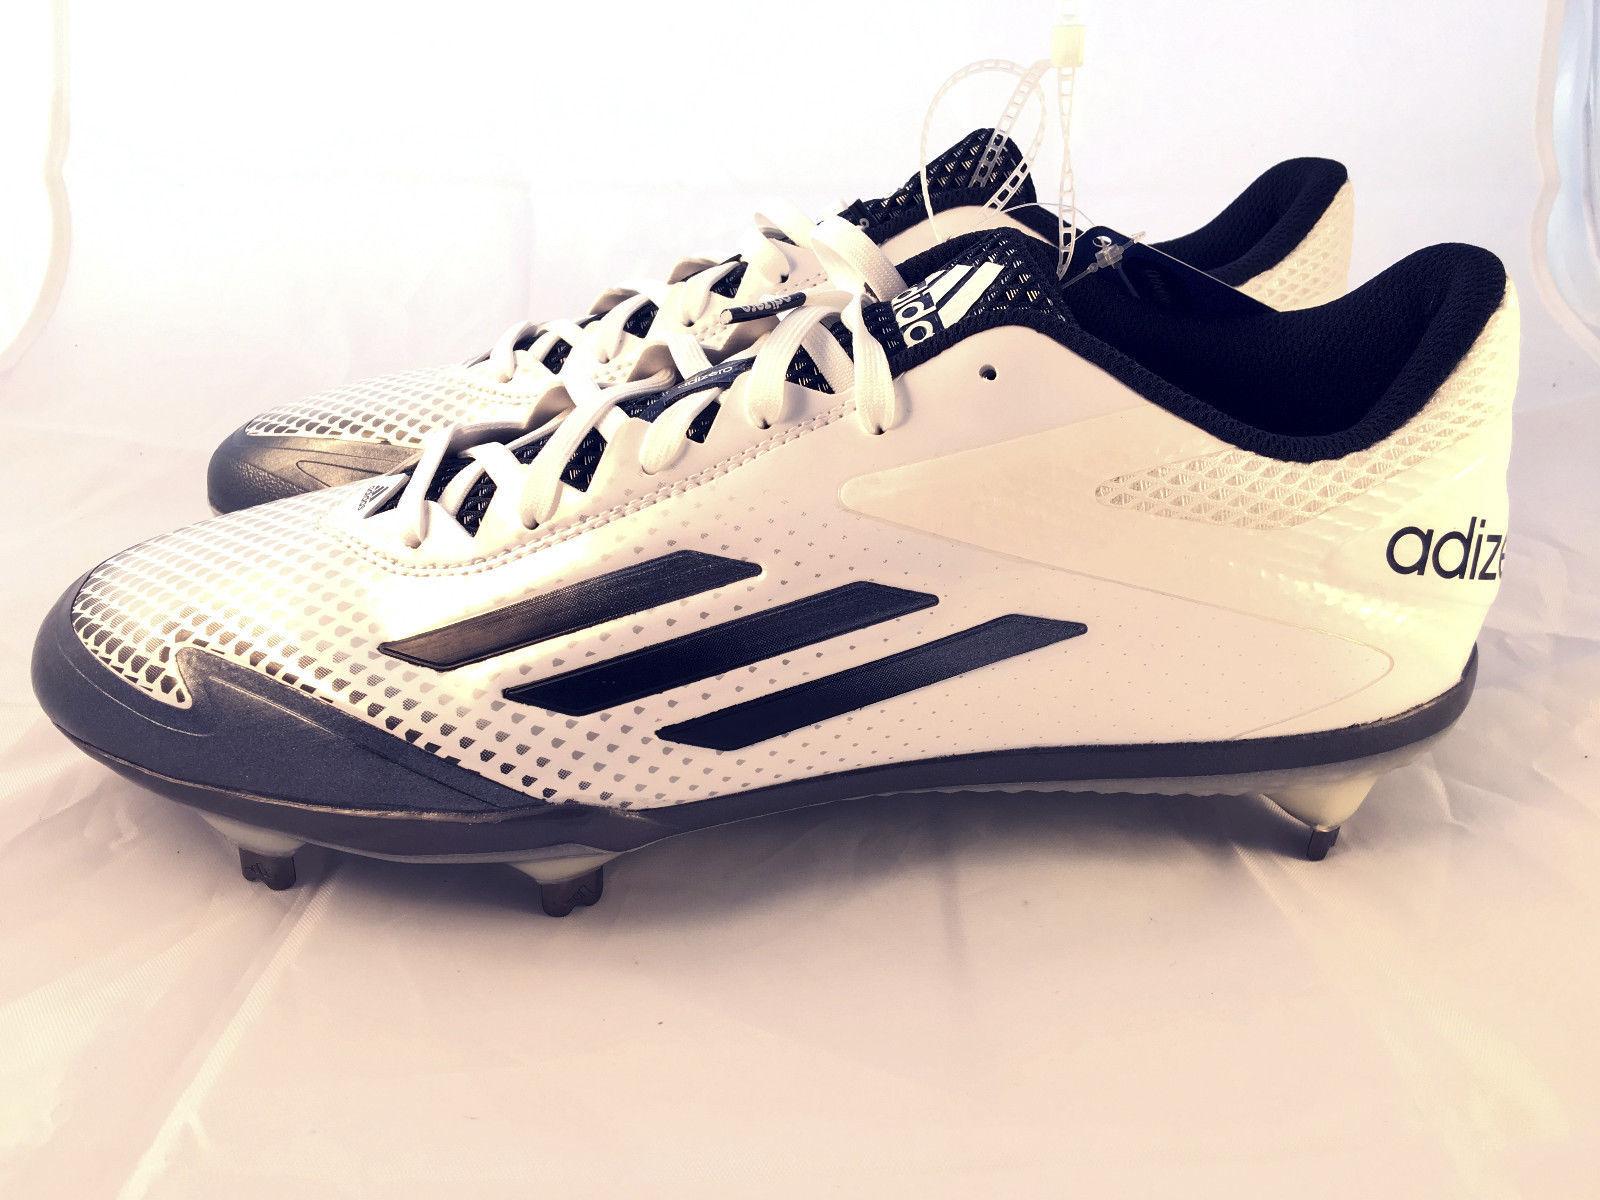 cheap for discount 45e45 a3448 ... Mens Adidas Adizero Afterburner 2.0 Metal Baseball Cleats White S85704  Sz. 10 ...